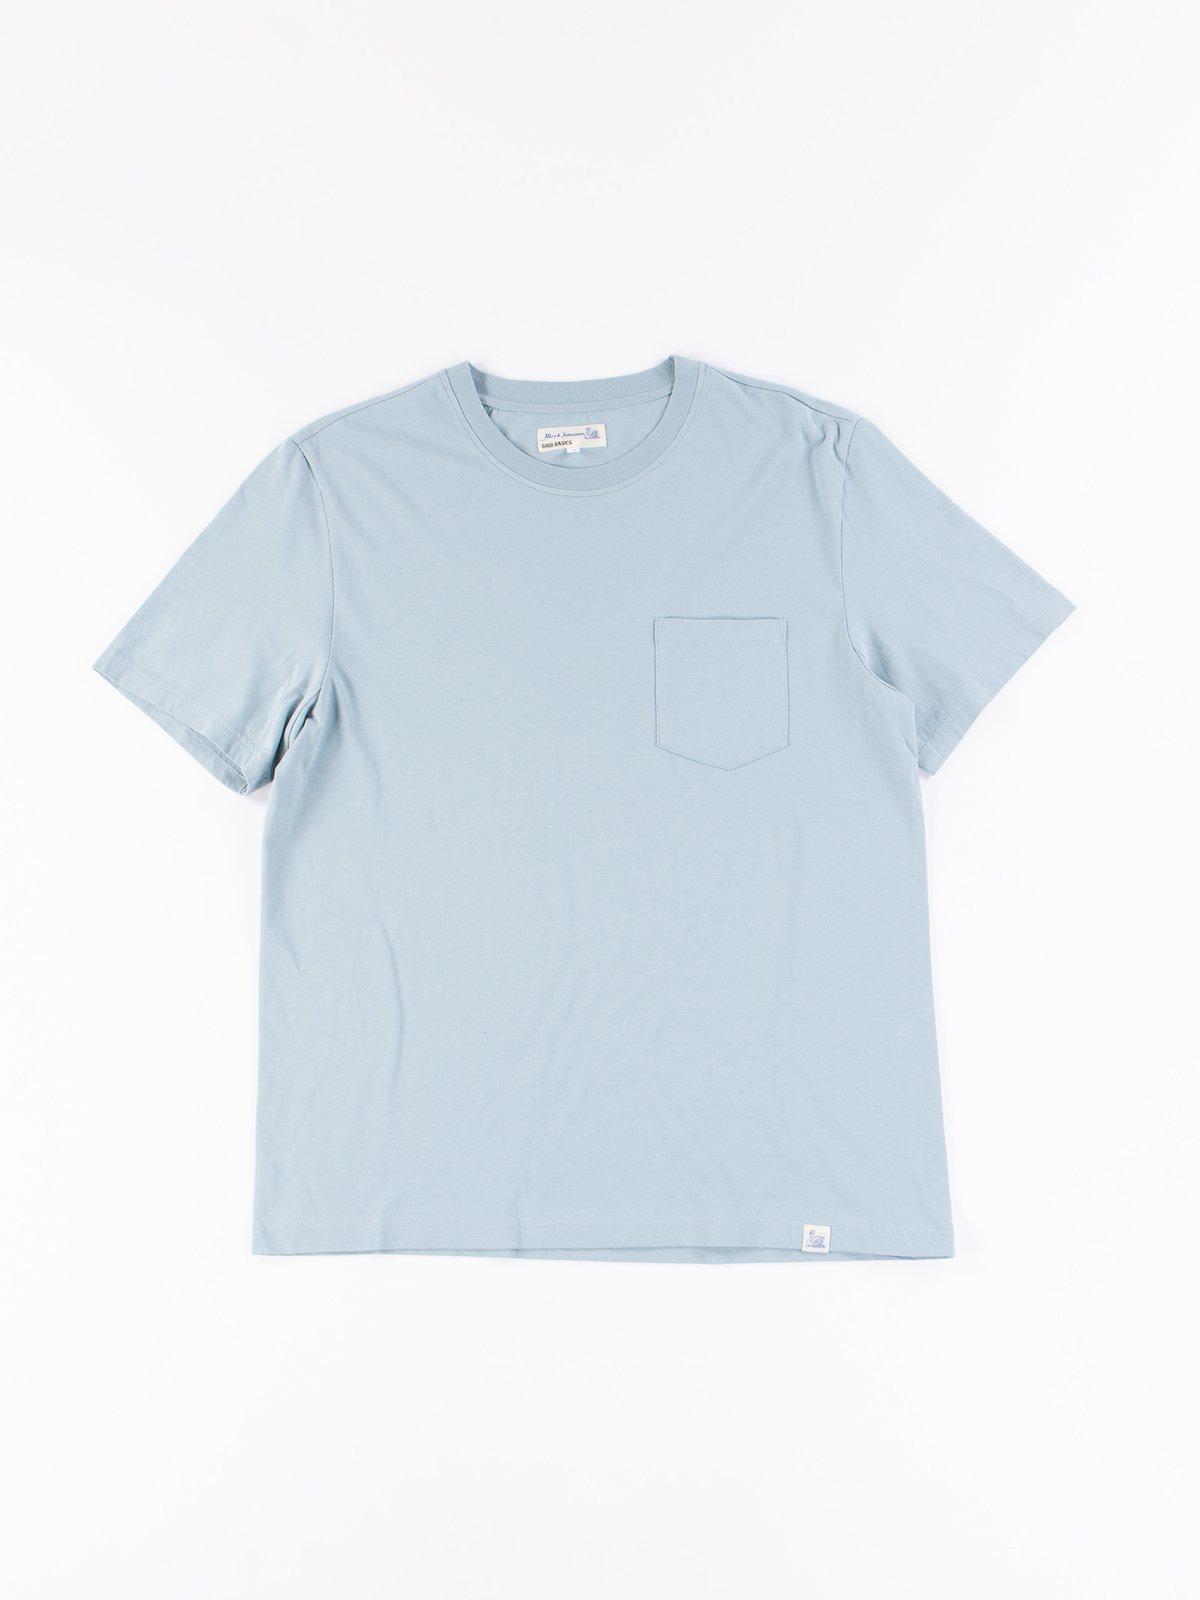 Pale Blue Good Basics CTP01 Pocket Crew Neck Tee - Image 1